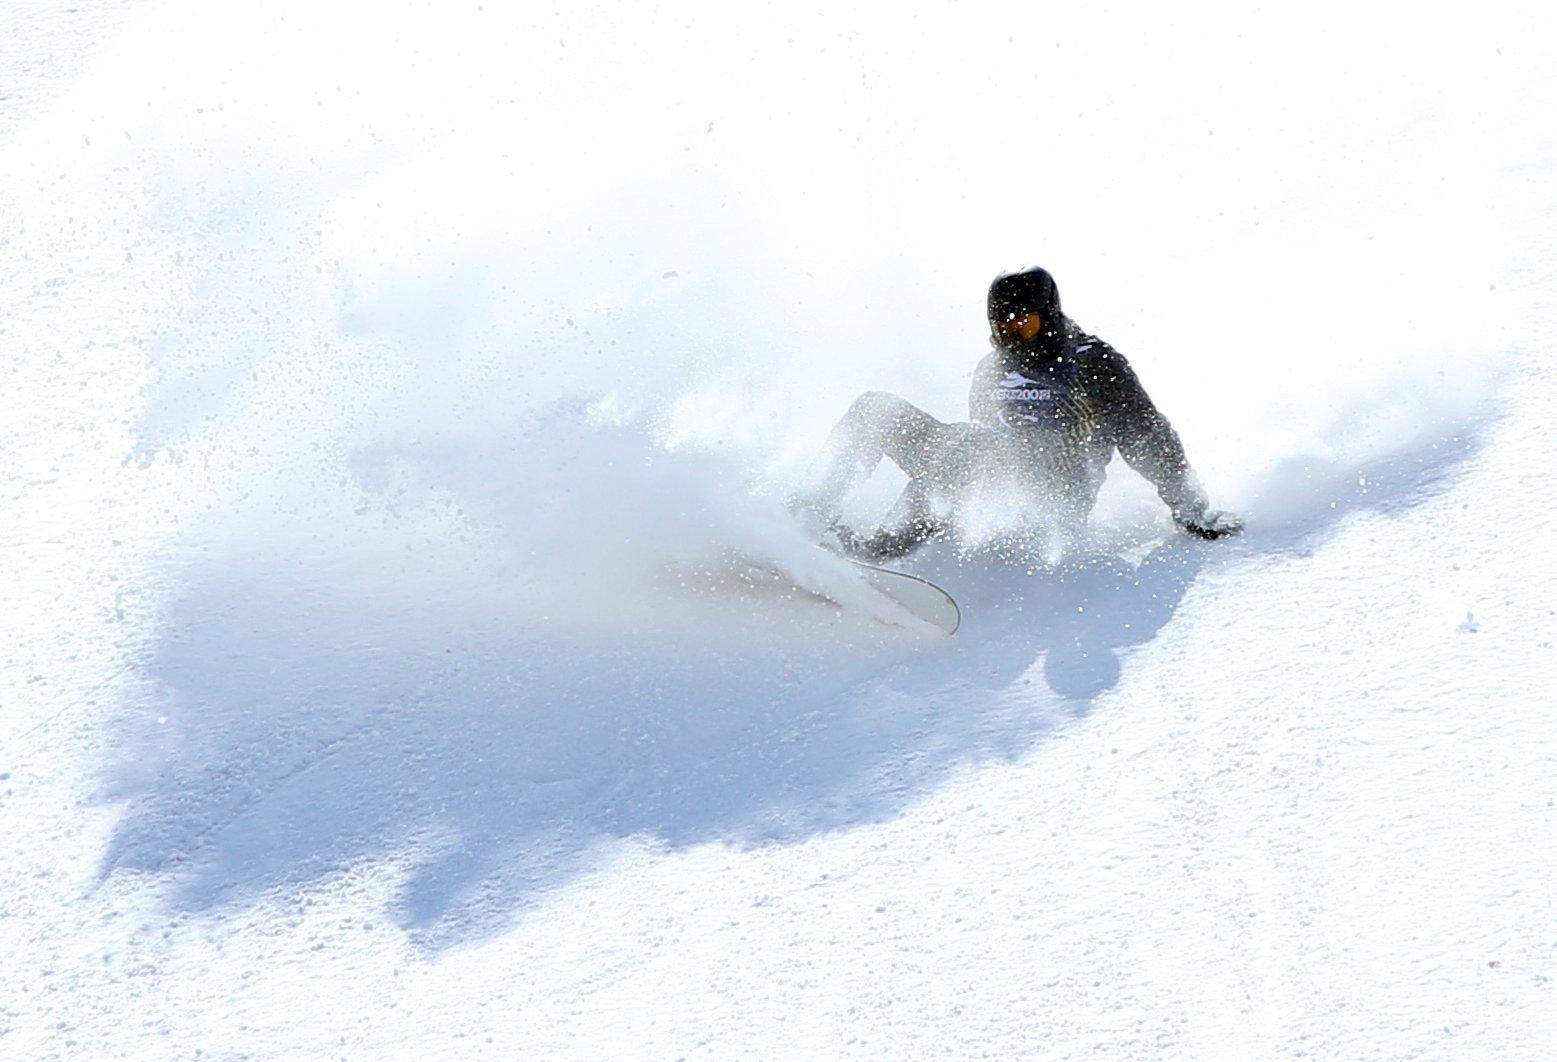 A sportsperson during the snowboard competition at Palandöken Ski Center, Erzurum, eastern Turkey, April 4, 2021. (AA Photo)